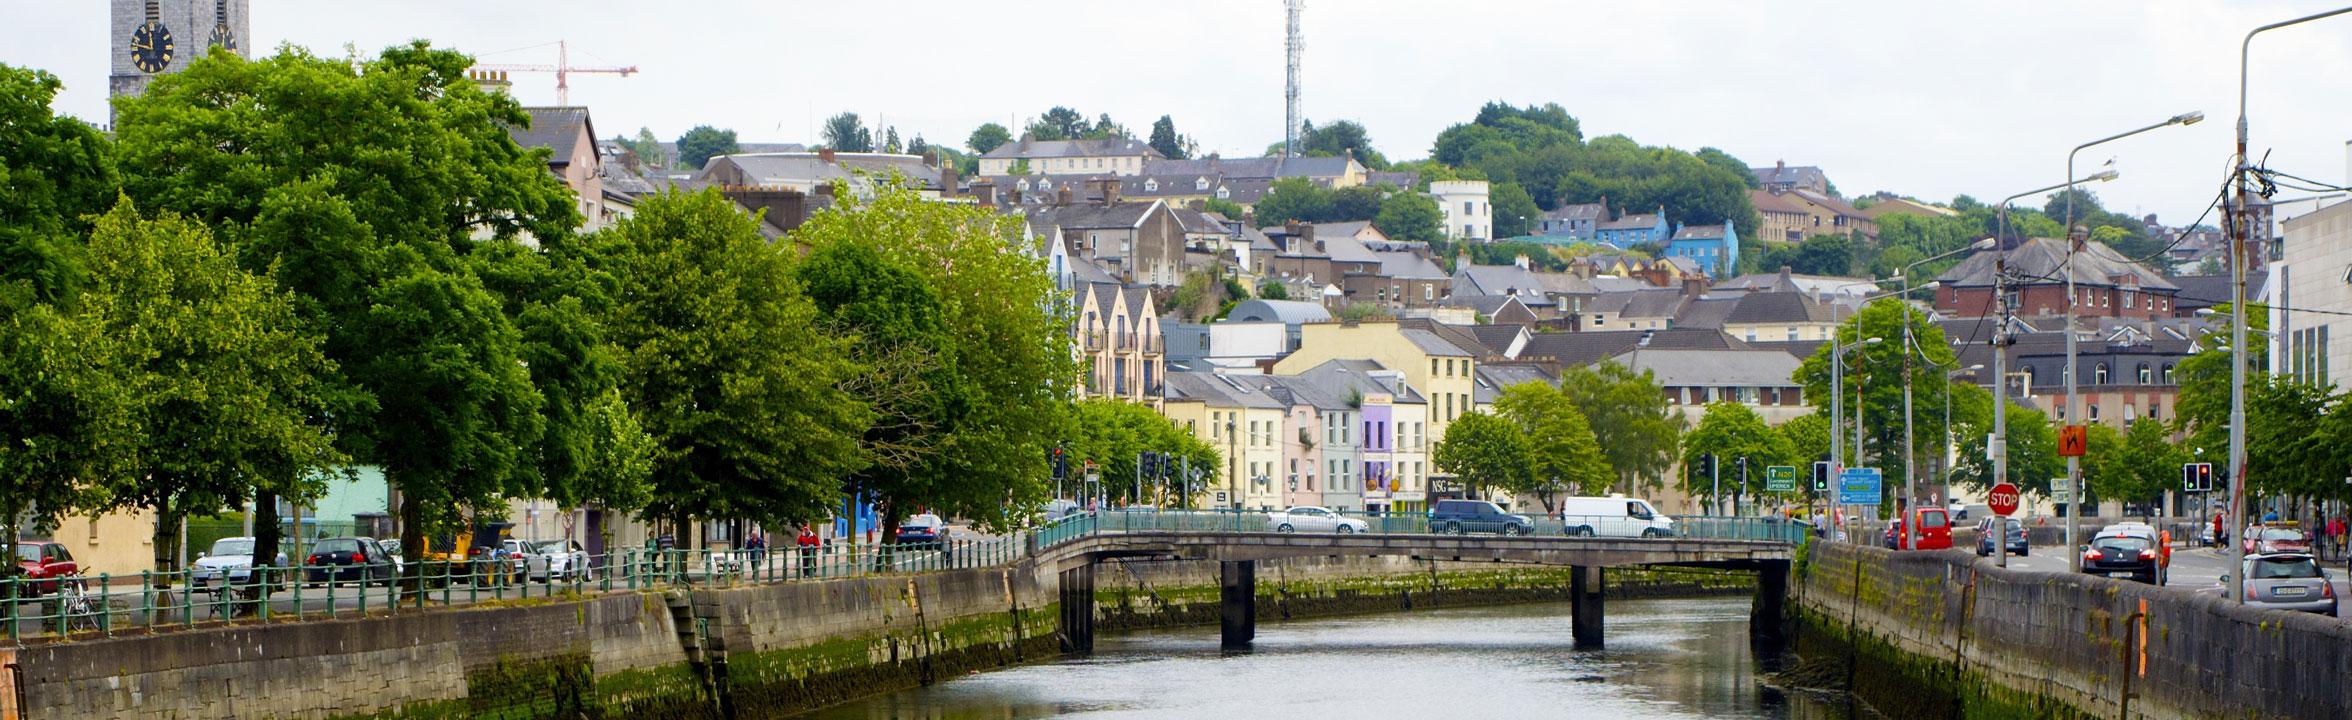 Ireland Cork